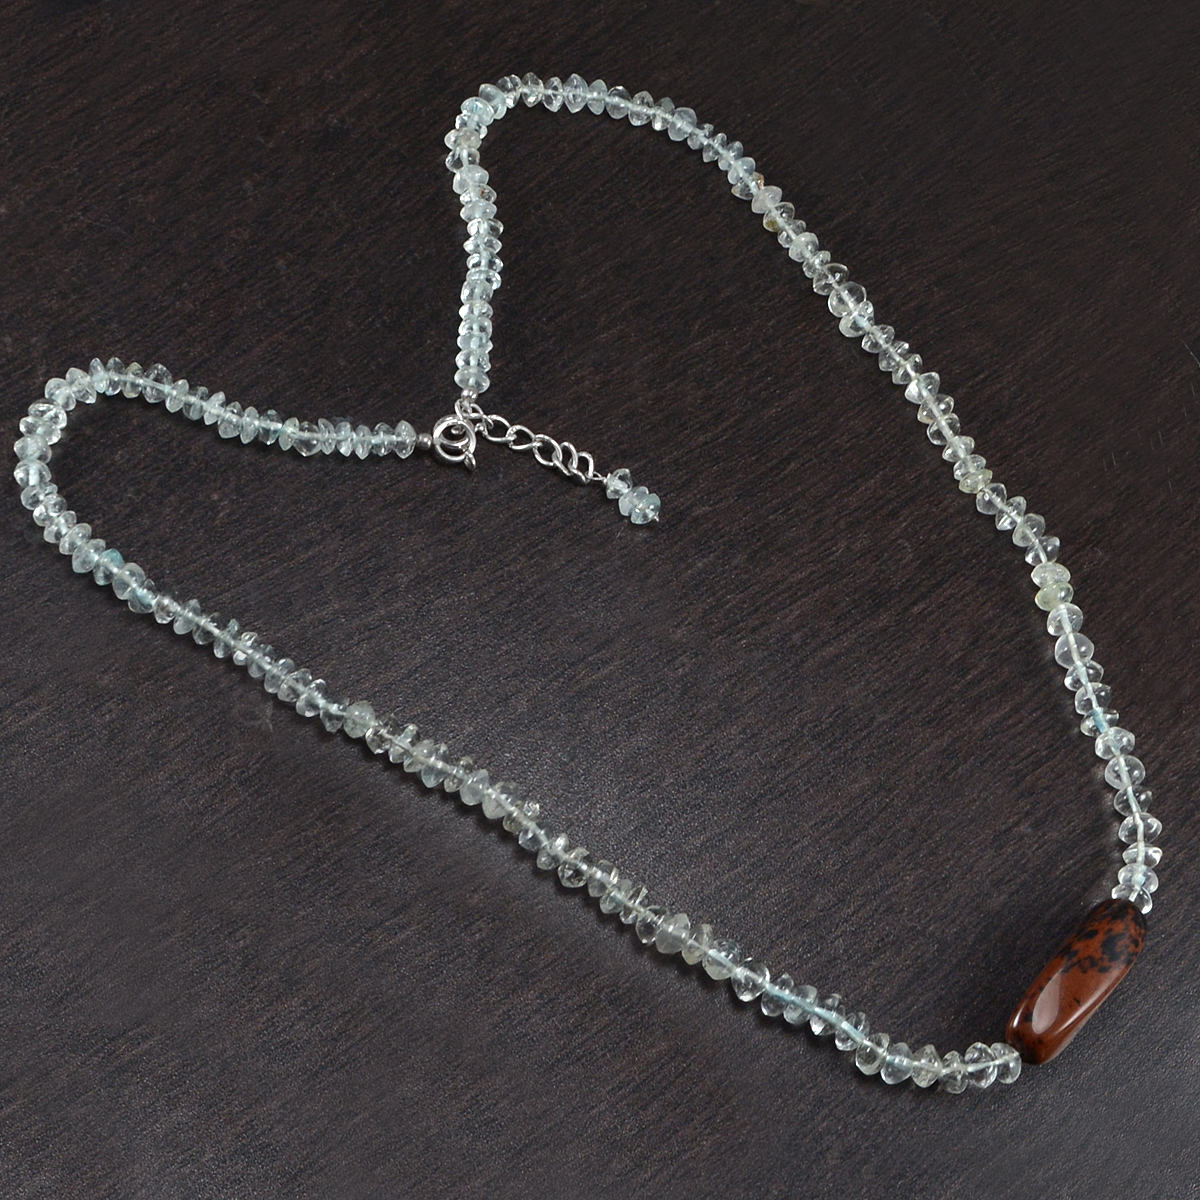 Beaded Crystal Quartz & Handmade Manufacturer Fancy Shape Mohagany Obsidian 925 Sterling Silver Jaipur Rajasthan India Necklace